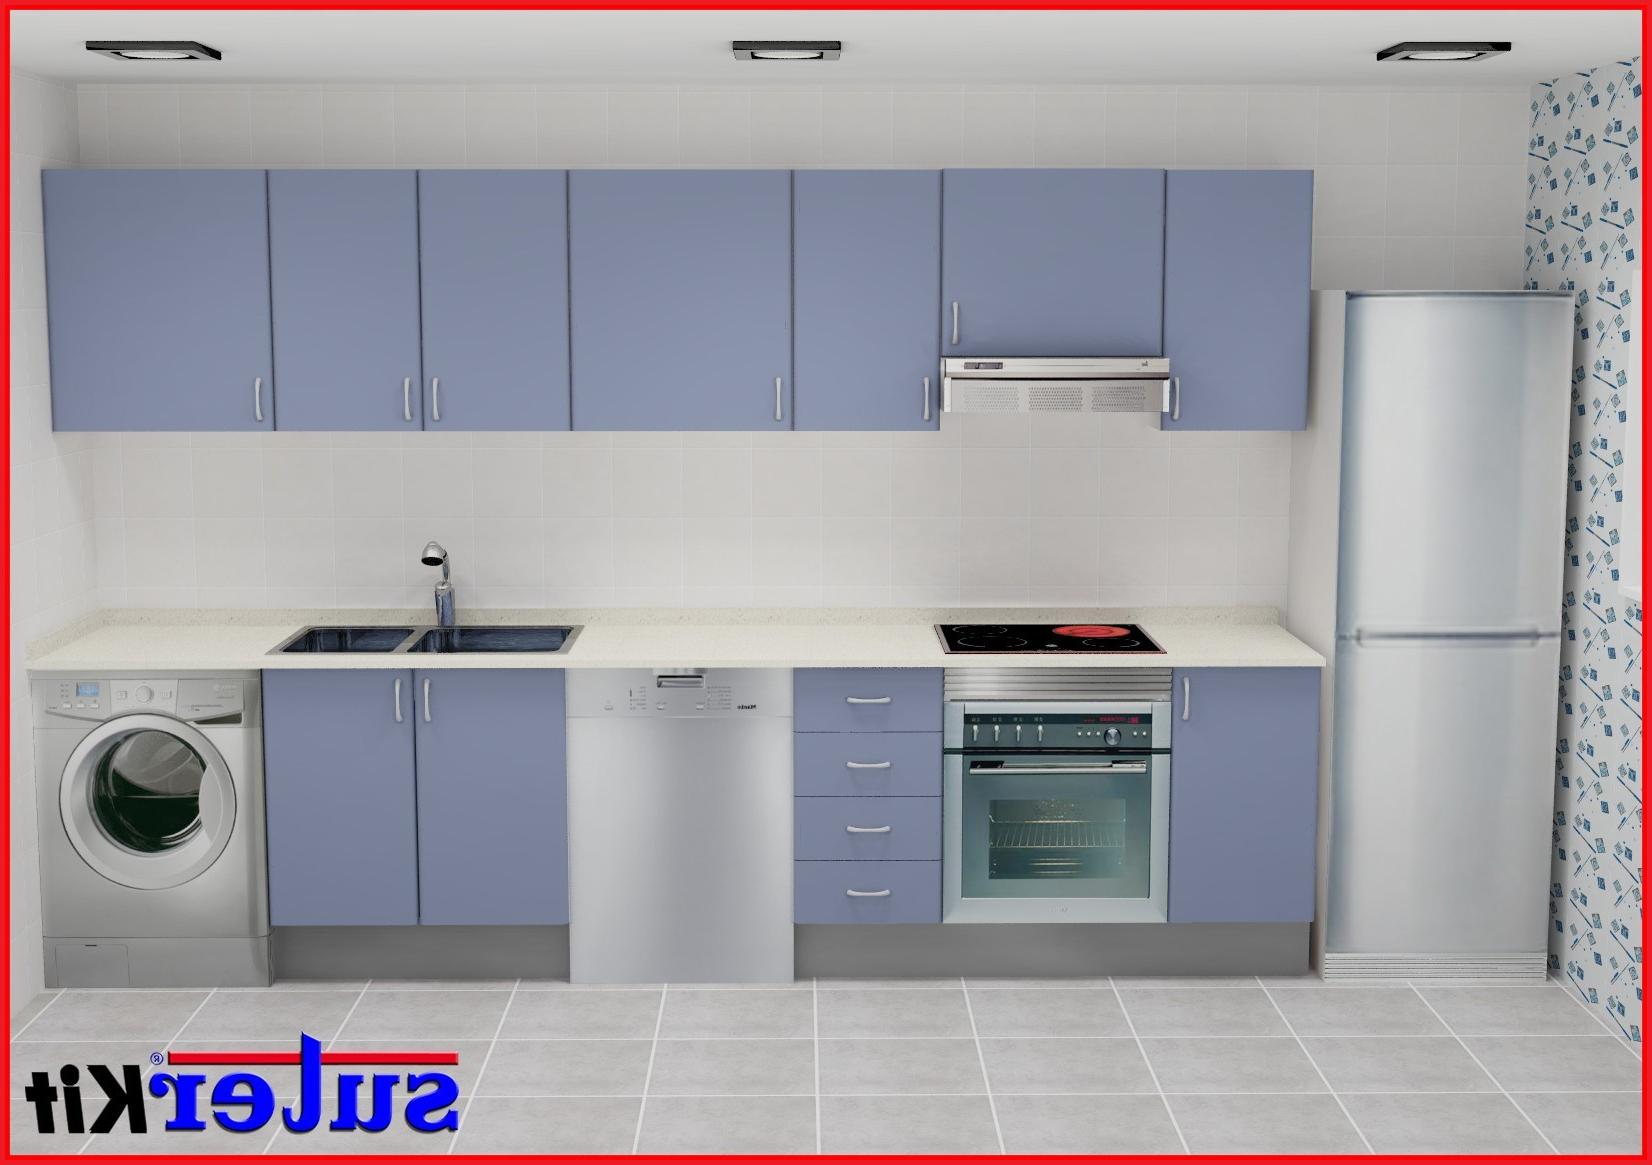 Muebles Cocina En Kit J7do Kits De Cocina Muebles De Cocina Easy ...